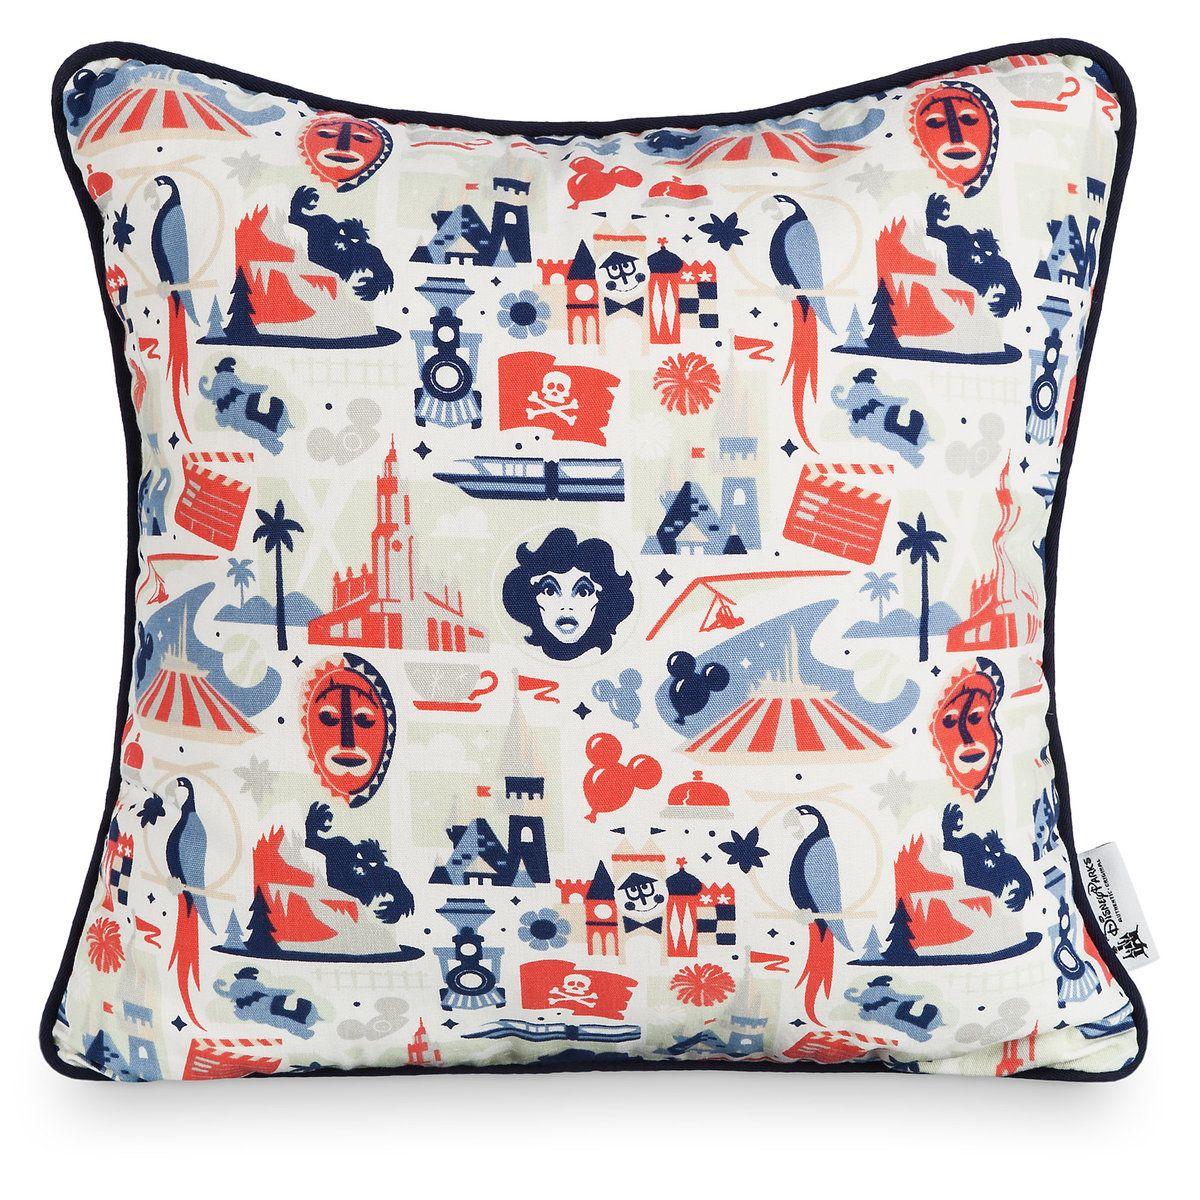 Disney Parks Icons Pillow